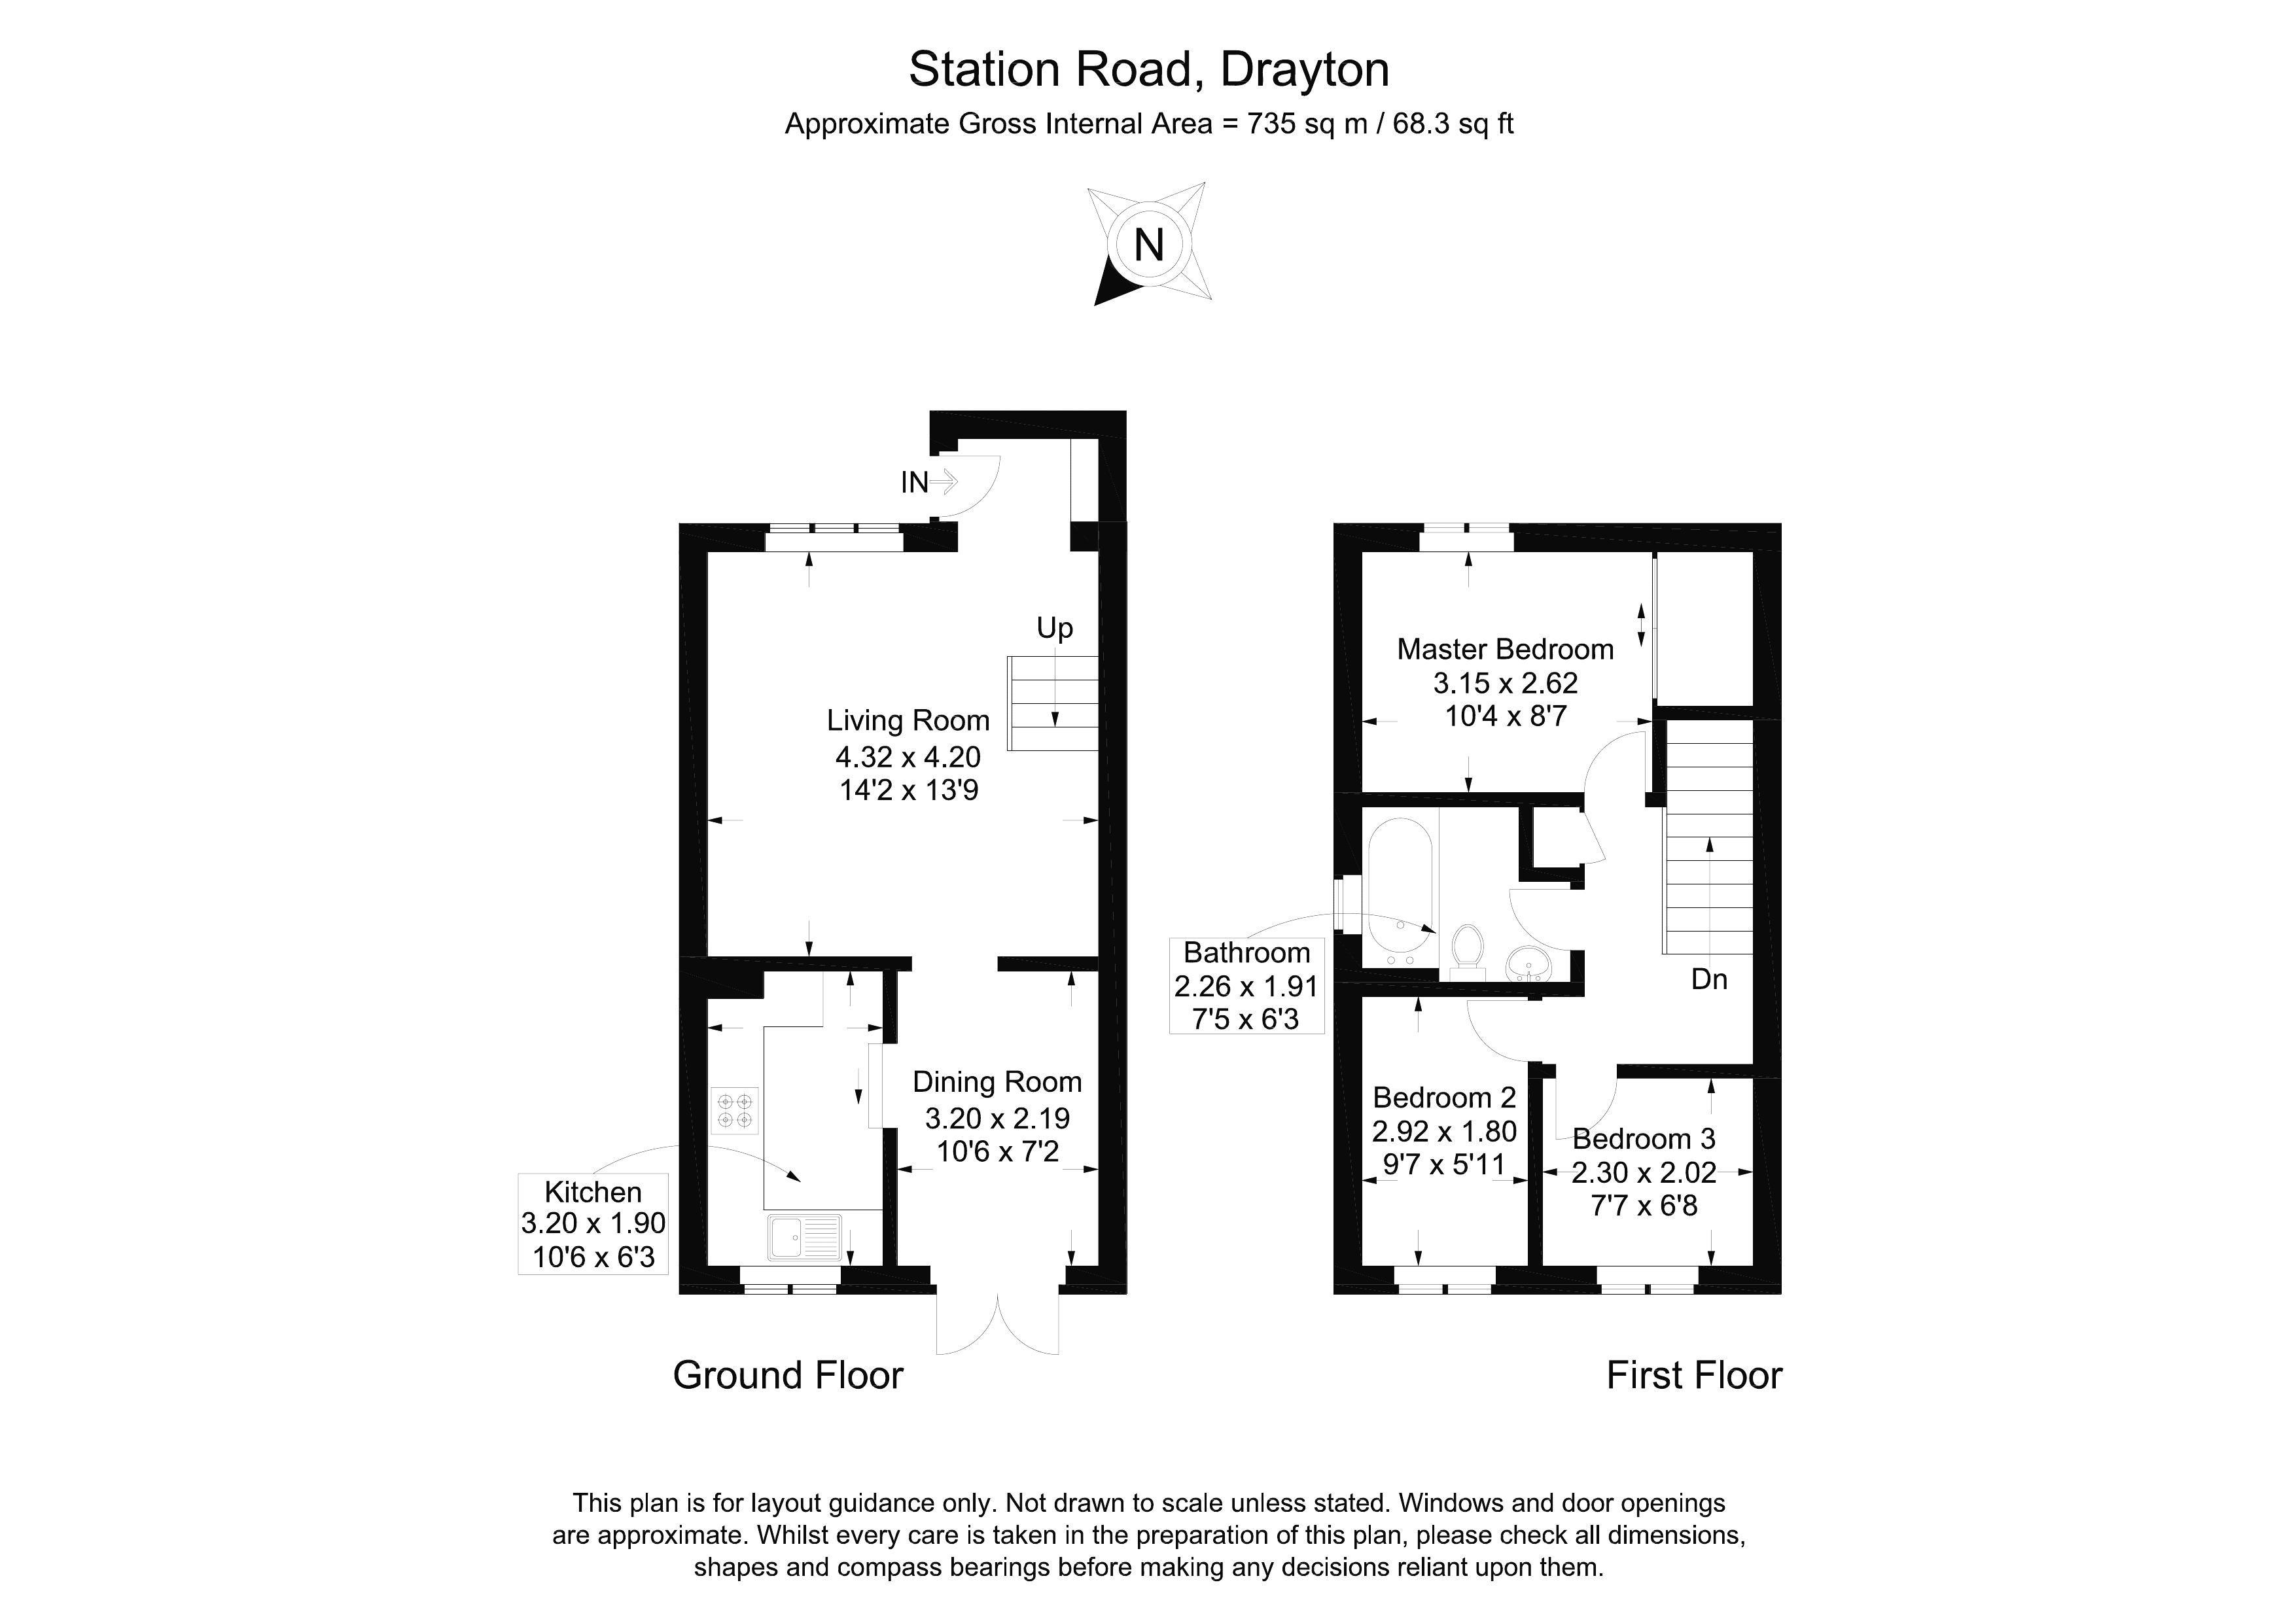 Station Road Drayton